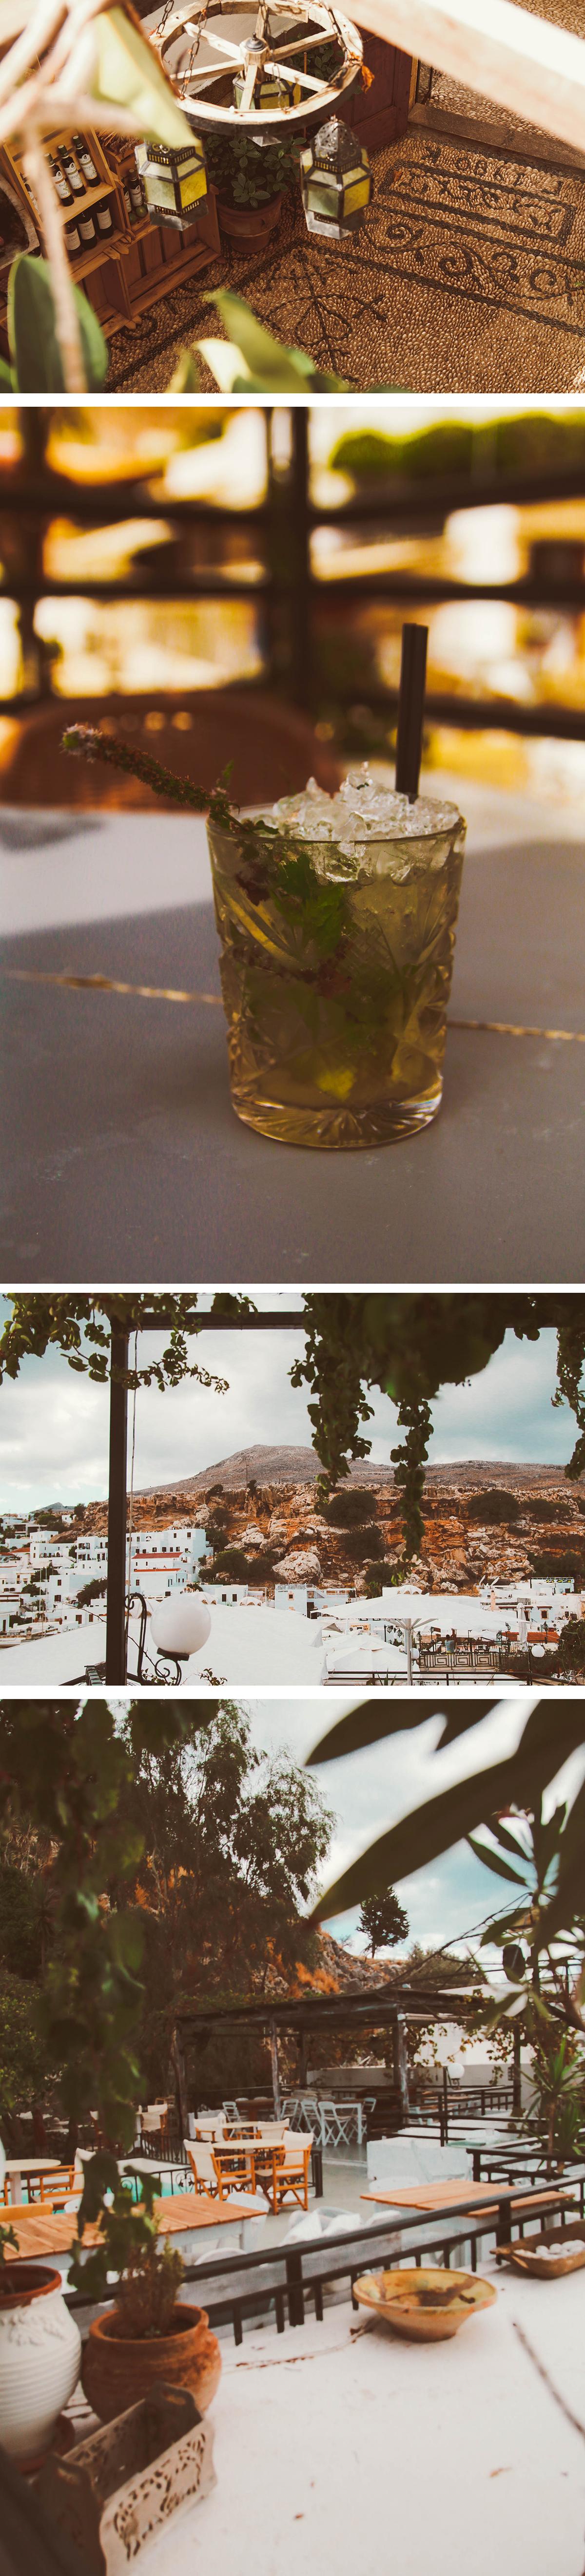 blog_lina_mallon_rhodos_traveldiary-(20-von-65)